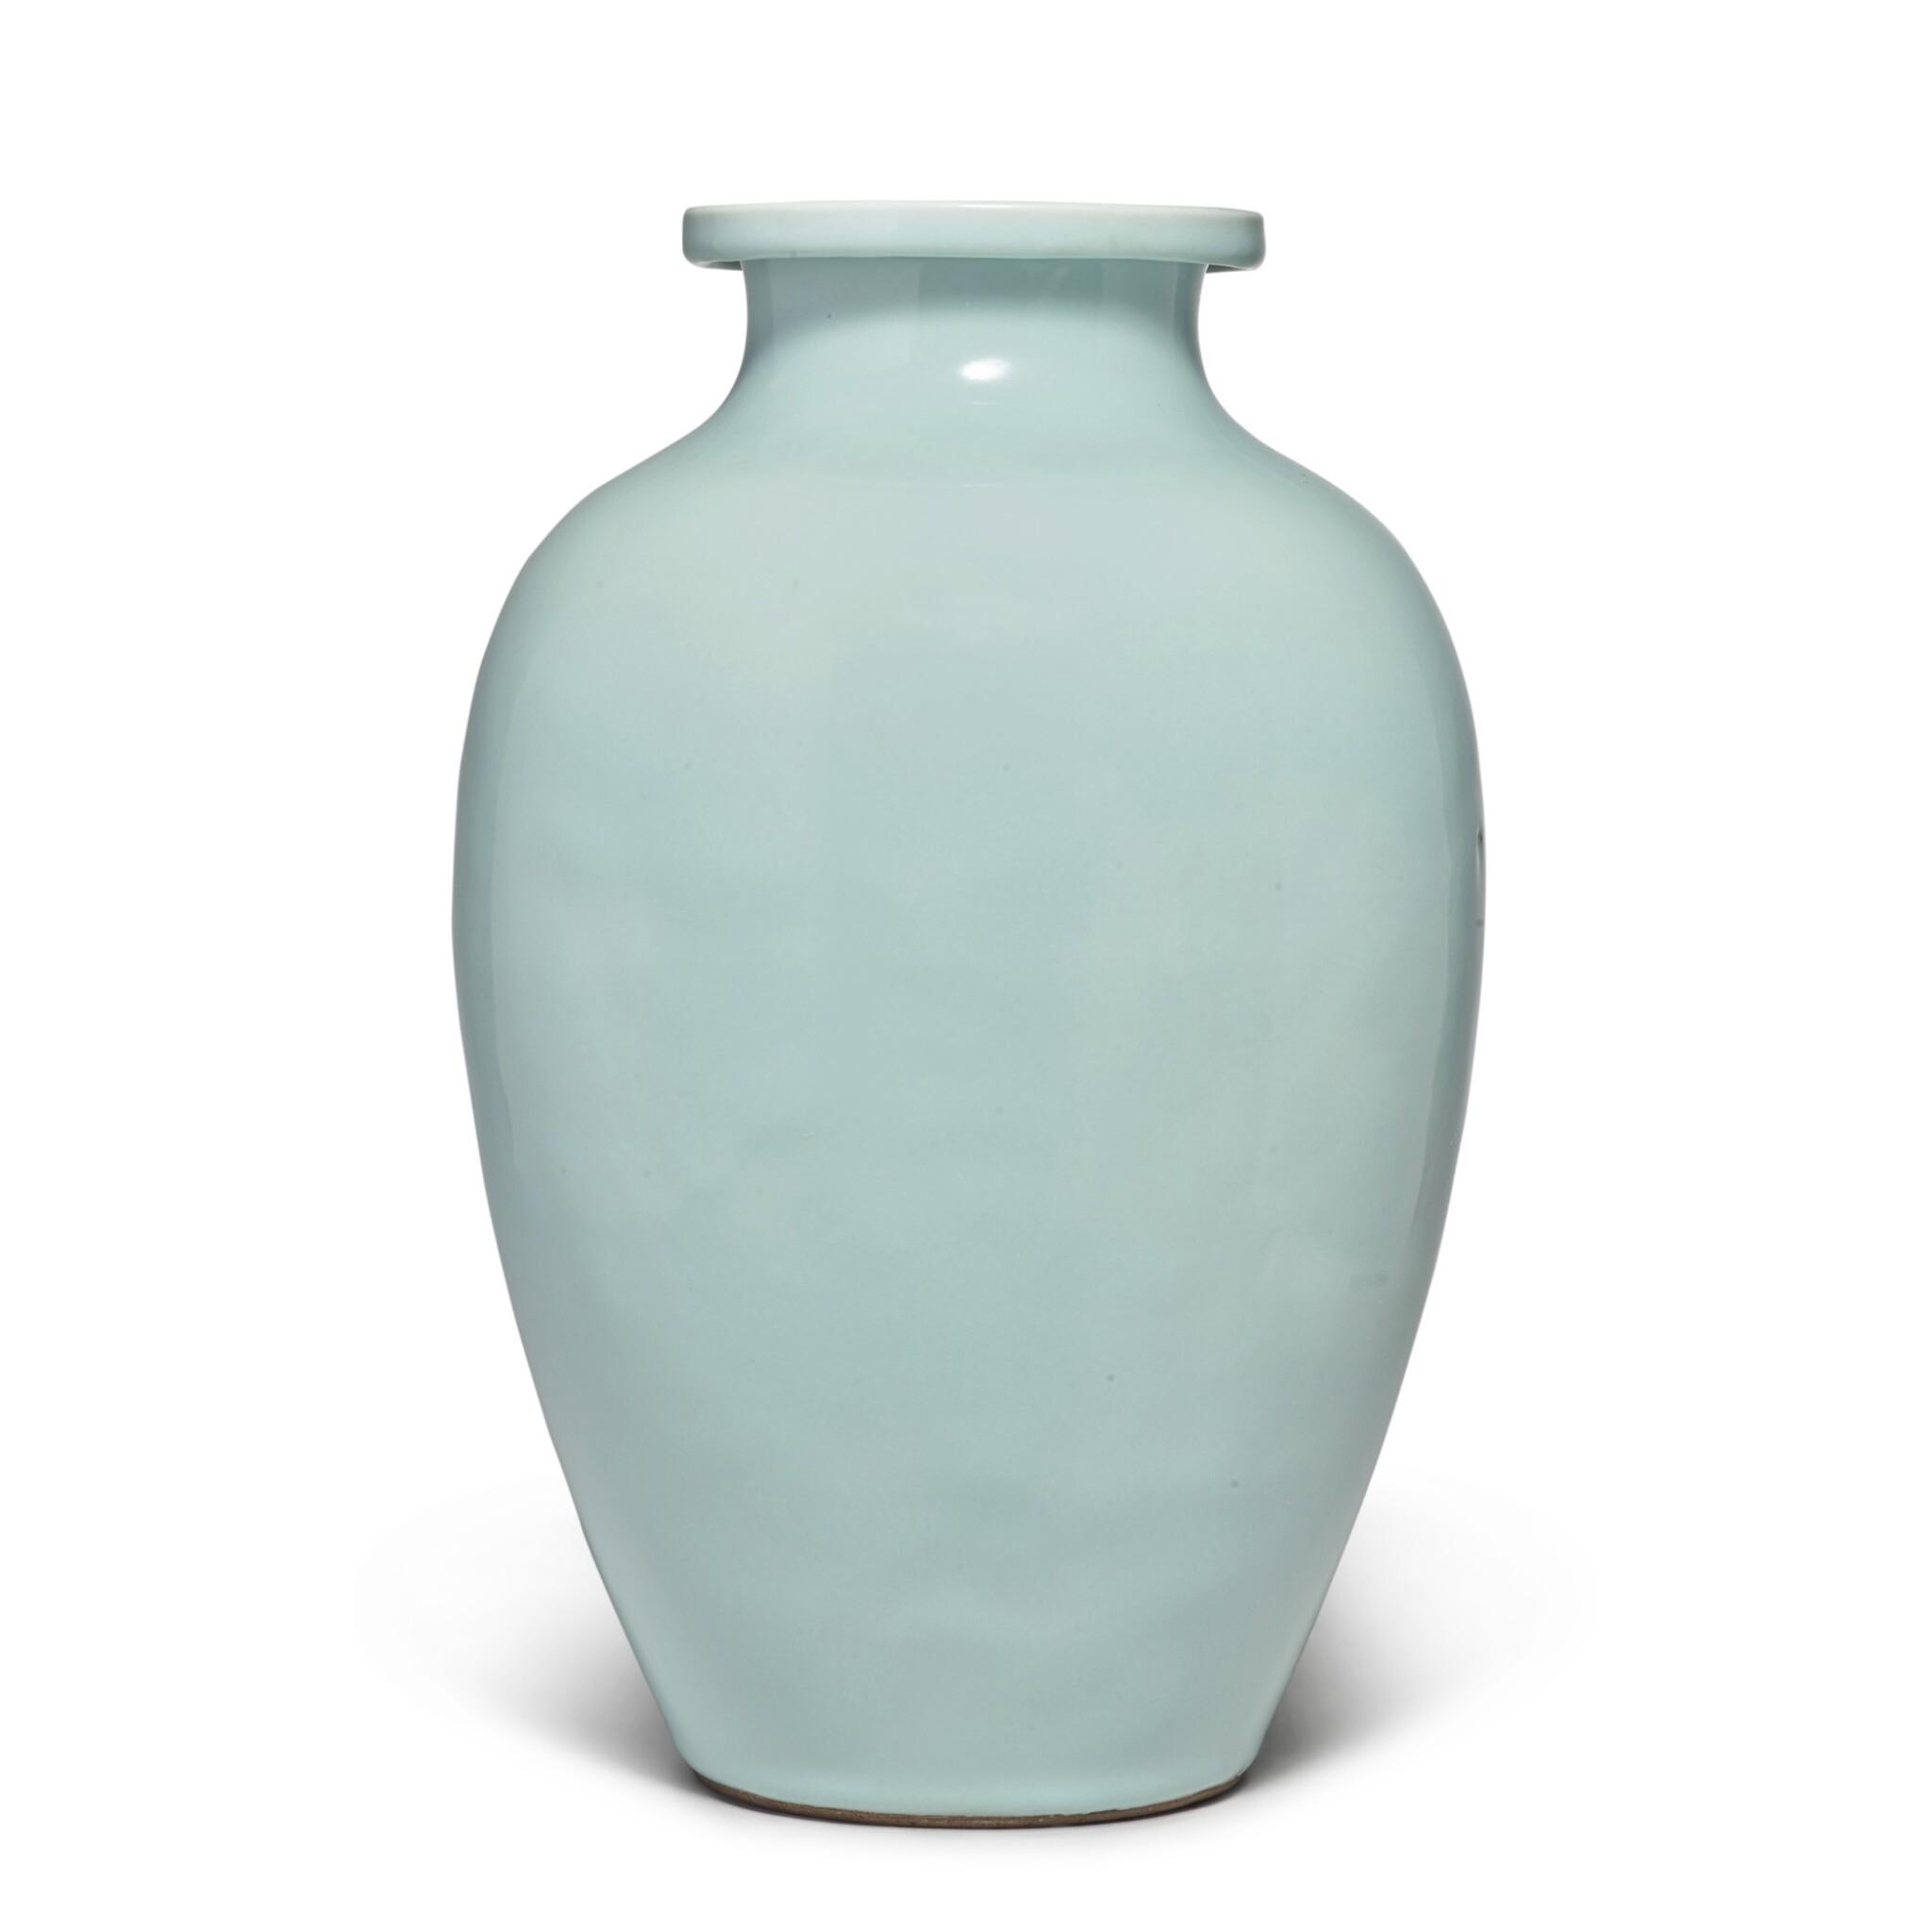 View full screen - View 1 of Lot 82. A Guan-type ovoid jar, Qing dynasty, 18th / 19th century   清十八 / 十九世紀 仿官釉罐.